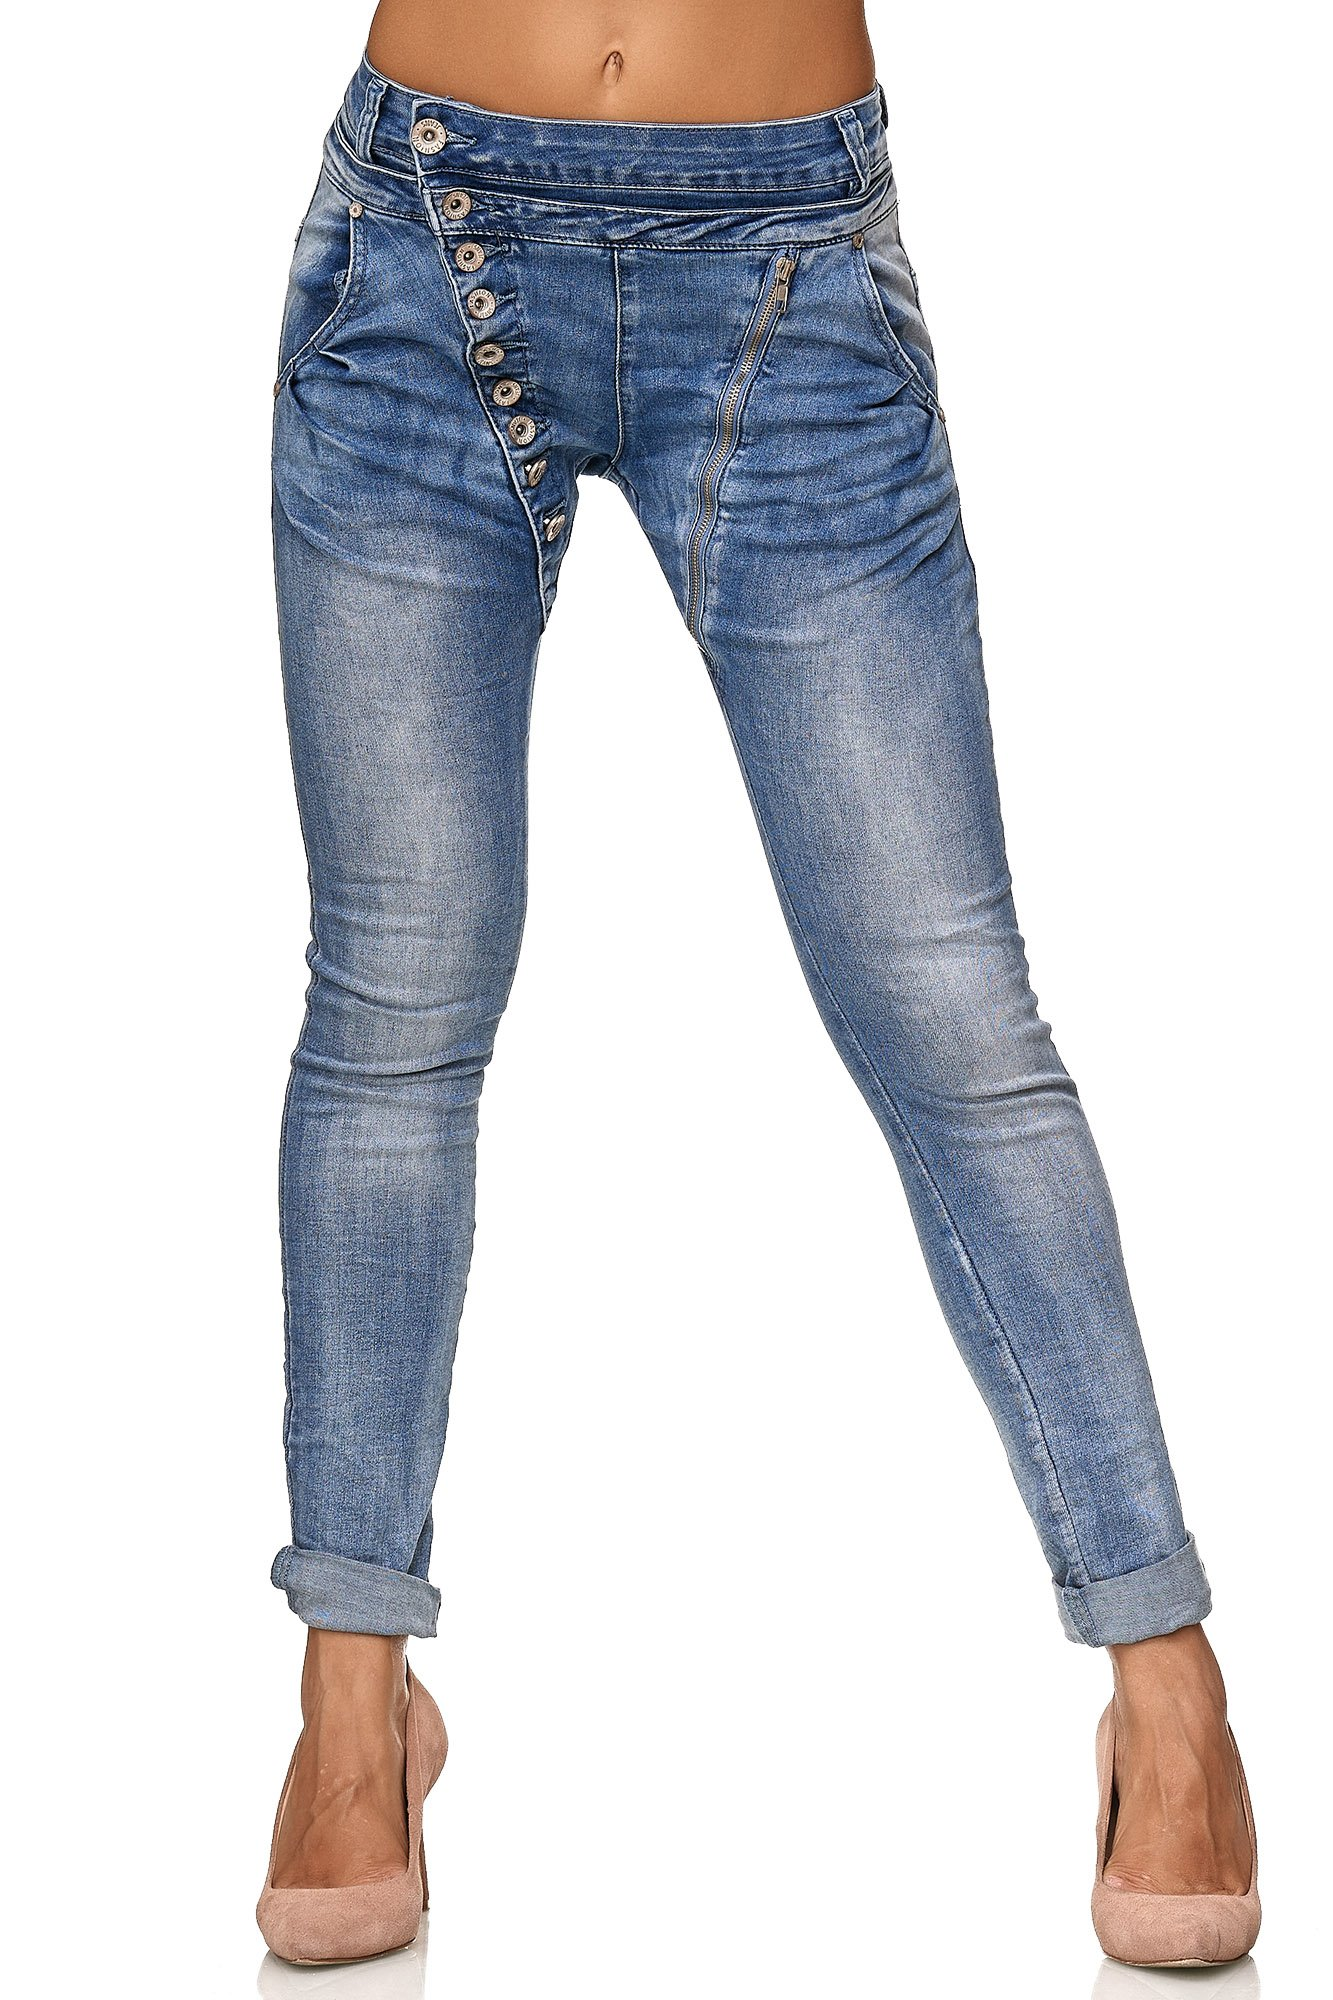 Elara Mujer Jeans | Botones | Cremallera | chunkyr Ayan product image